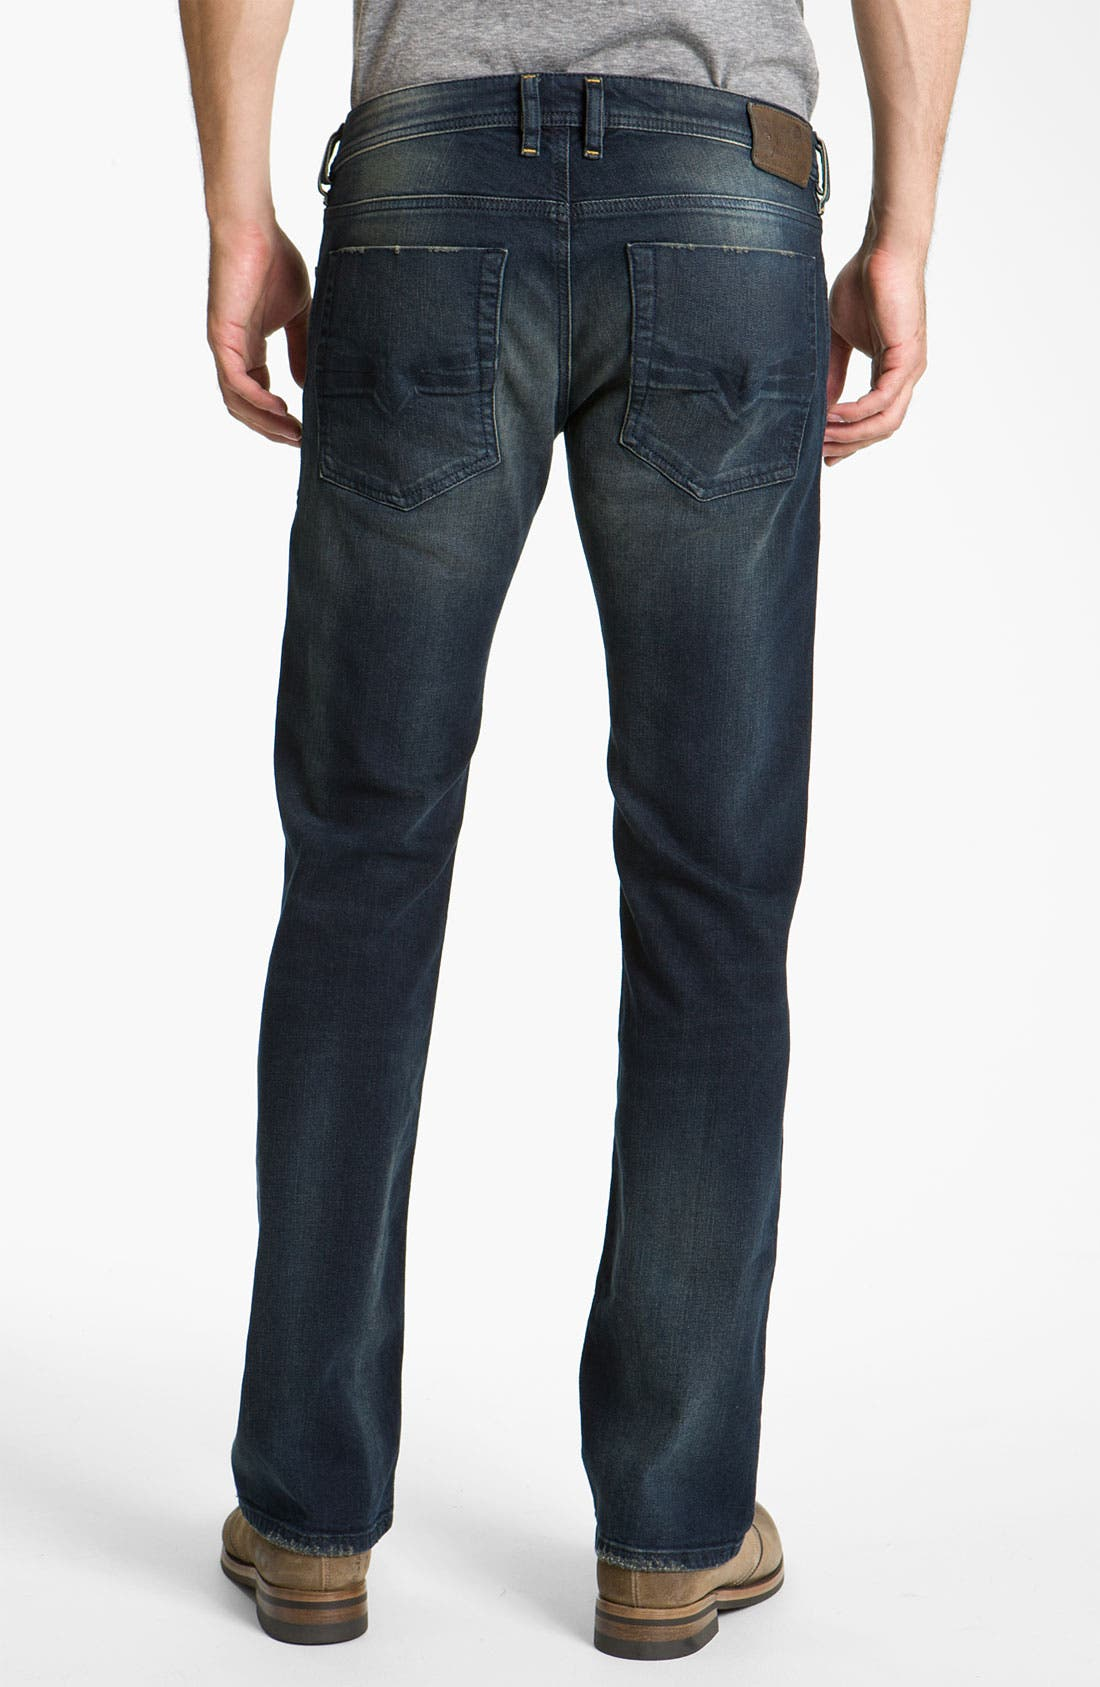 Alternate Image 1 Selected - DIESEL® 'Zatiny' Bootcut Jeans (802C)